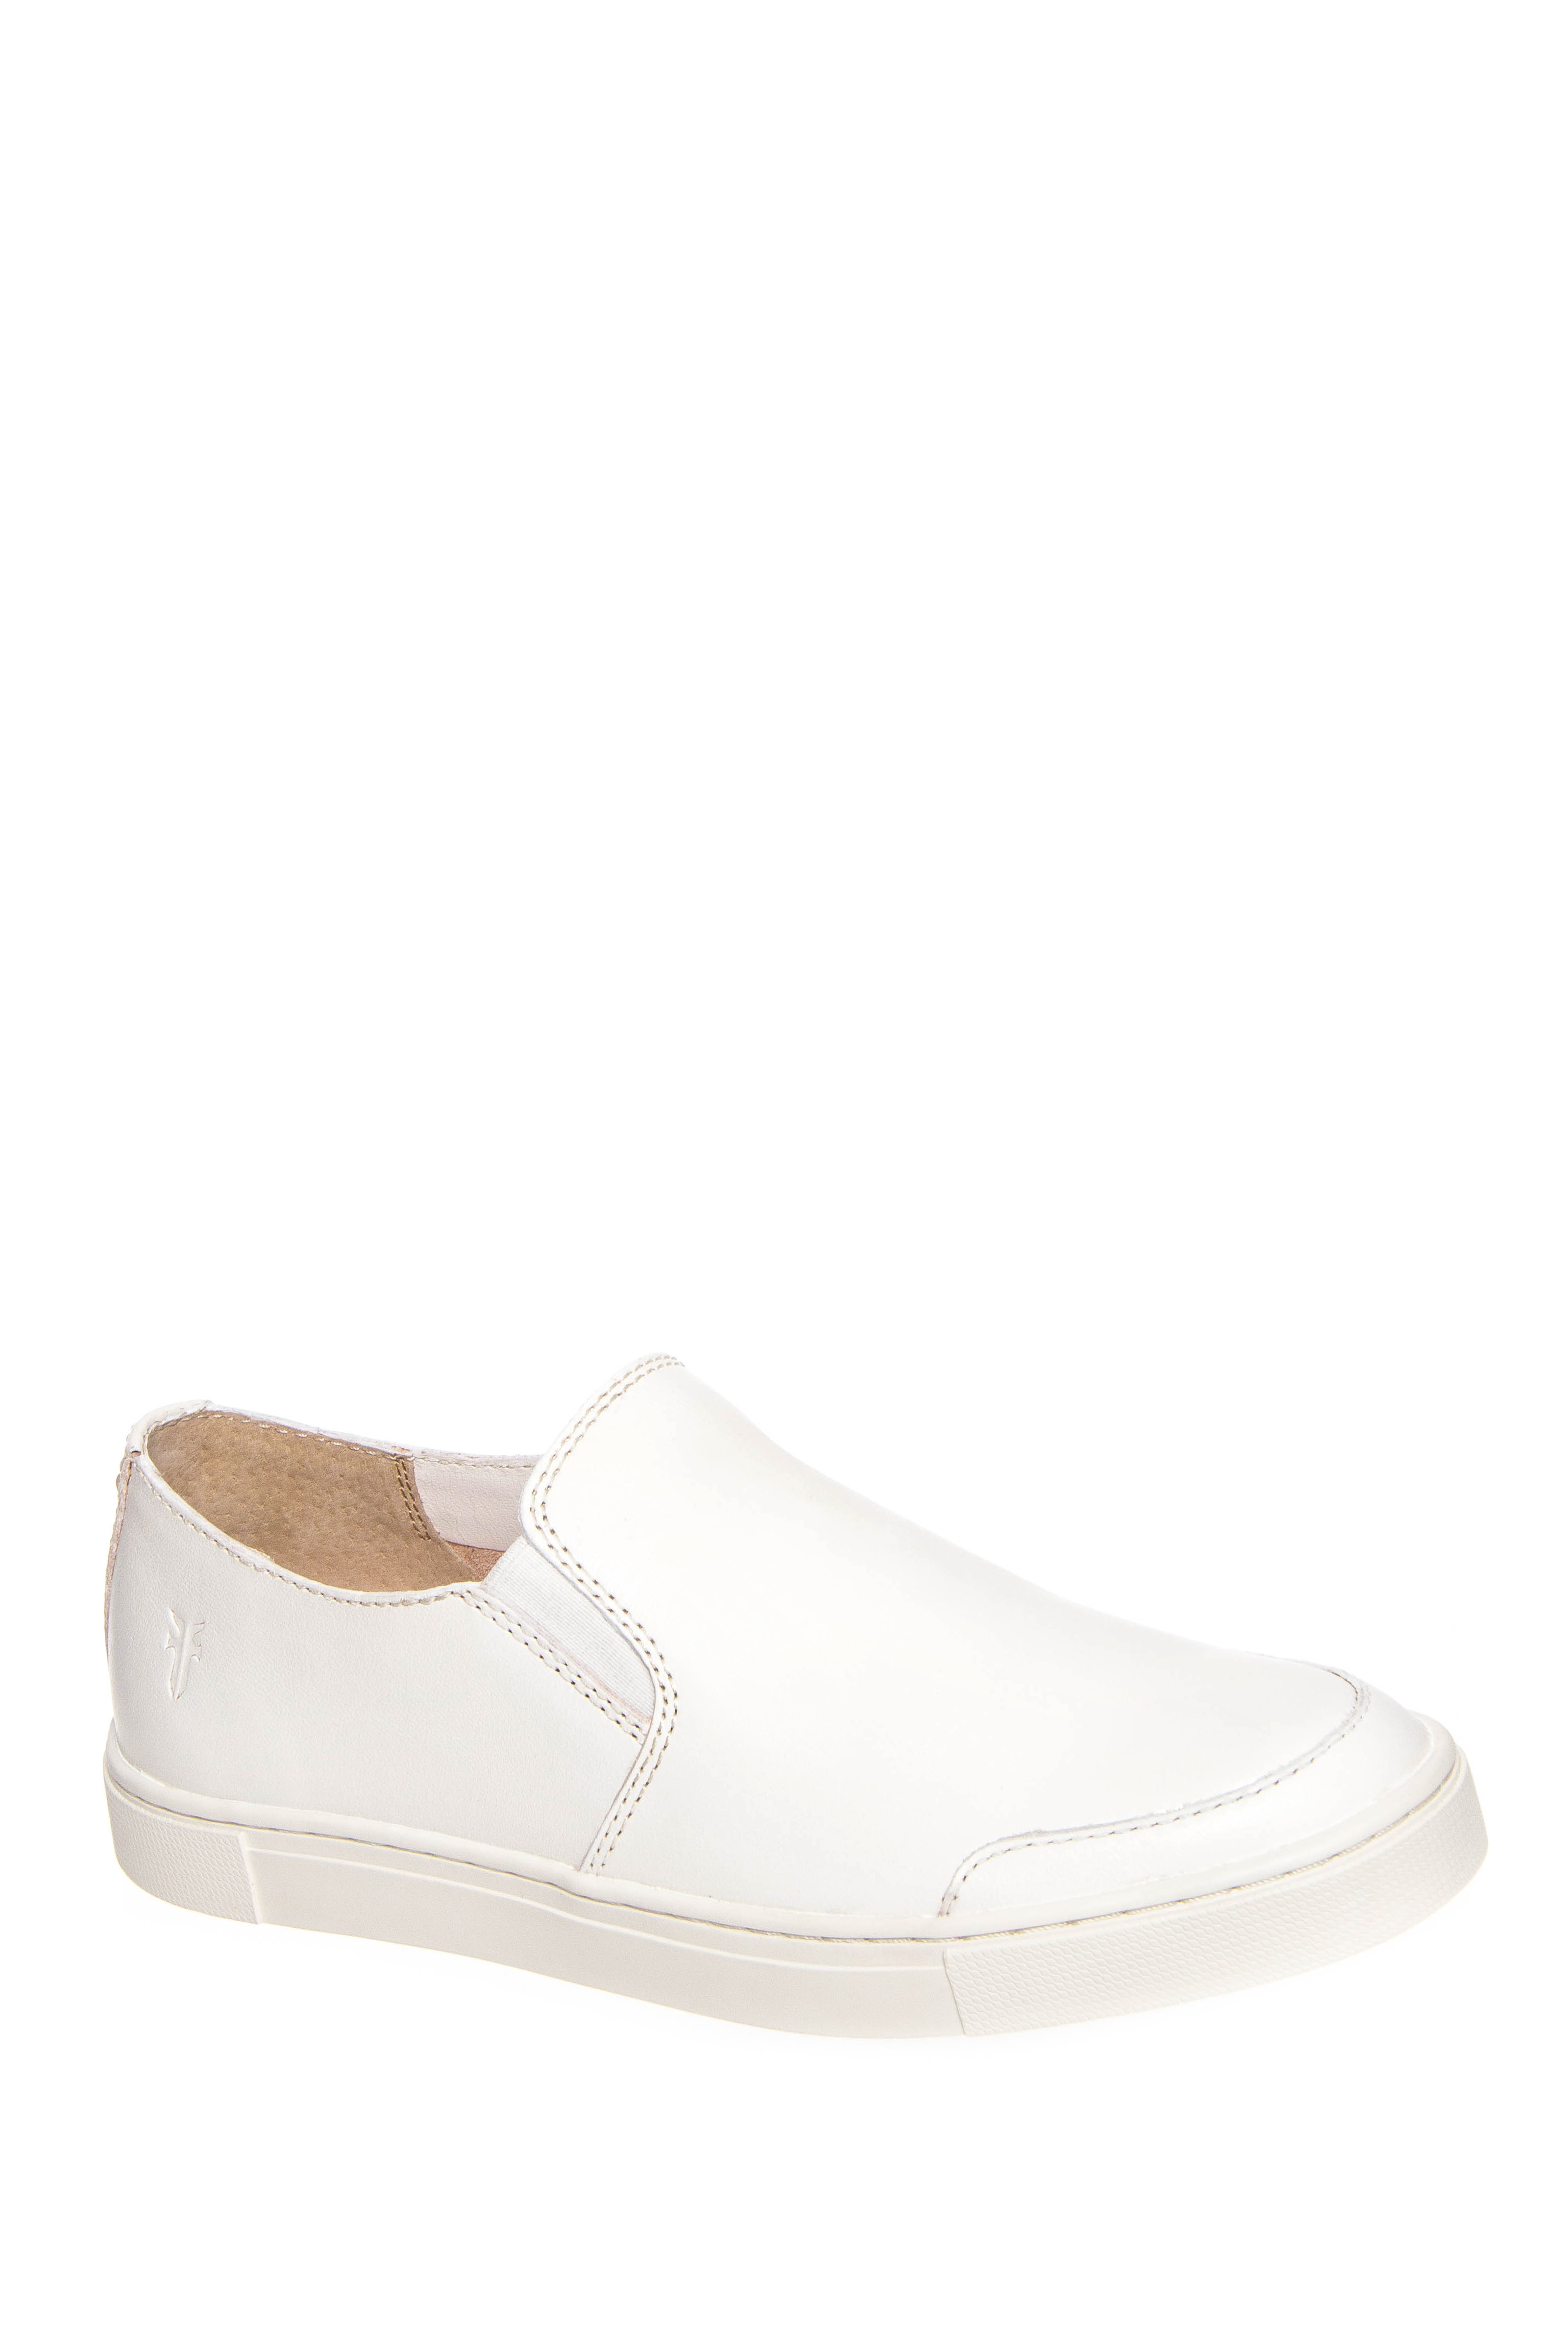 Frye Gemma Slip-On Sneakers - White